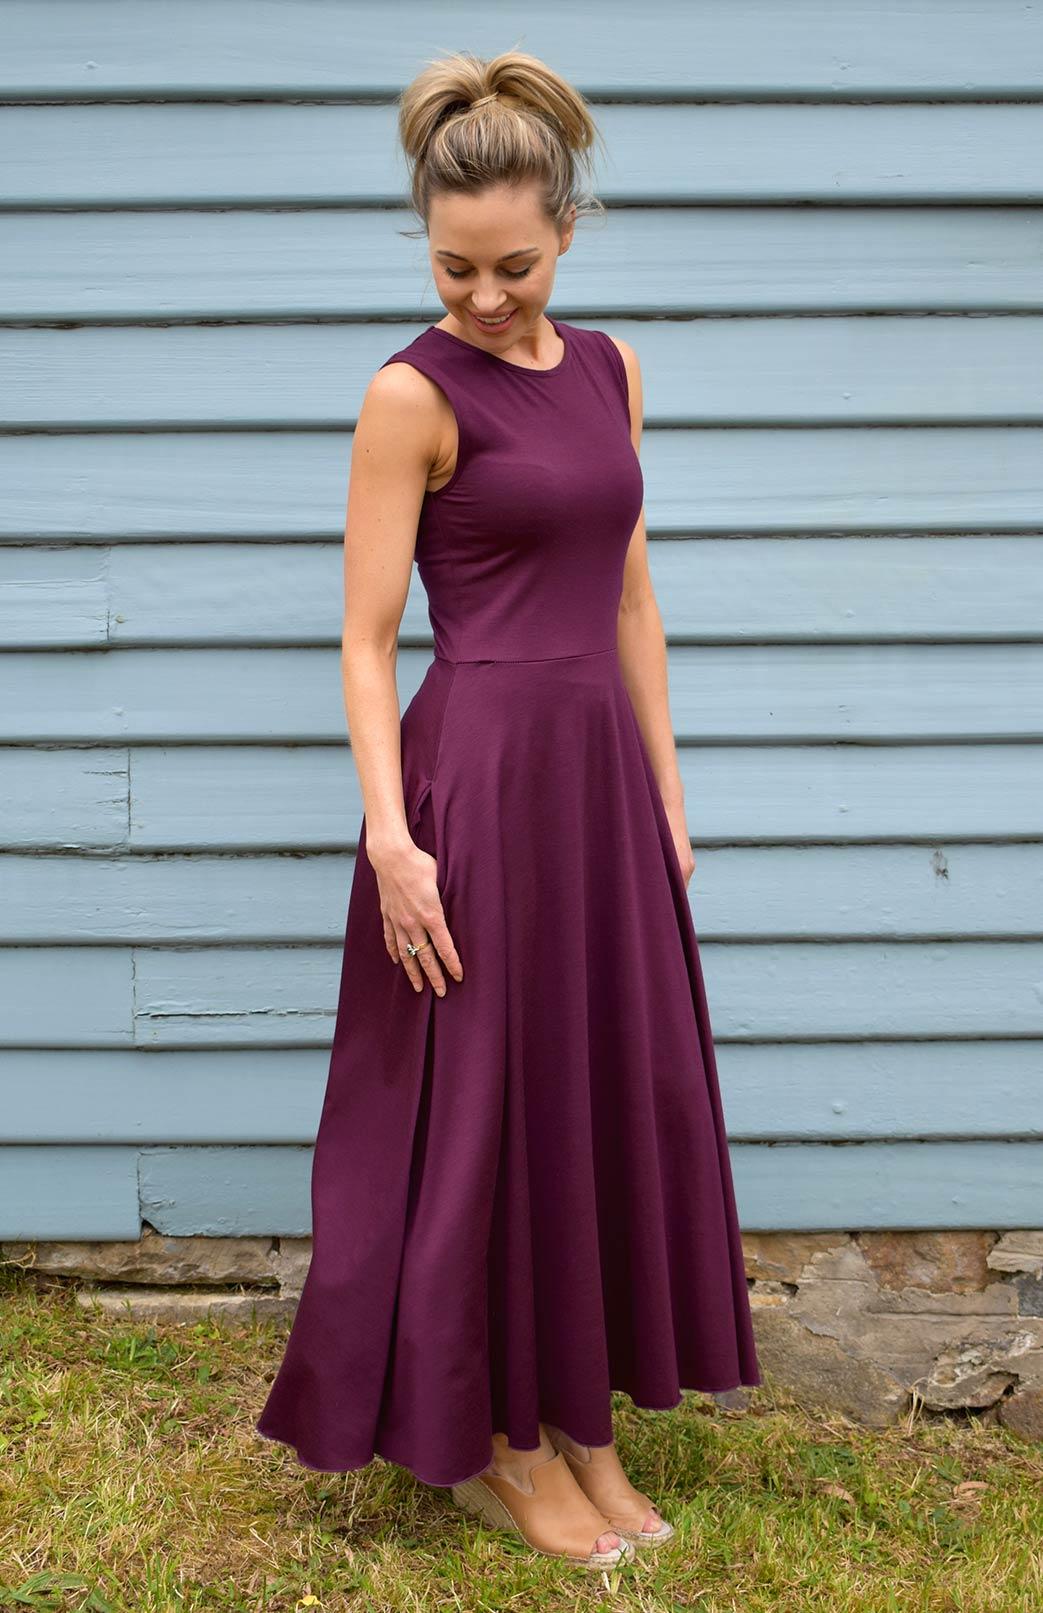 Flo Dress - Women's purple sleeveless merino wool dress with high neckline, side pockets, long skirt and true waist - Smitten Merino Tasmania Australia